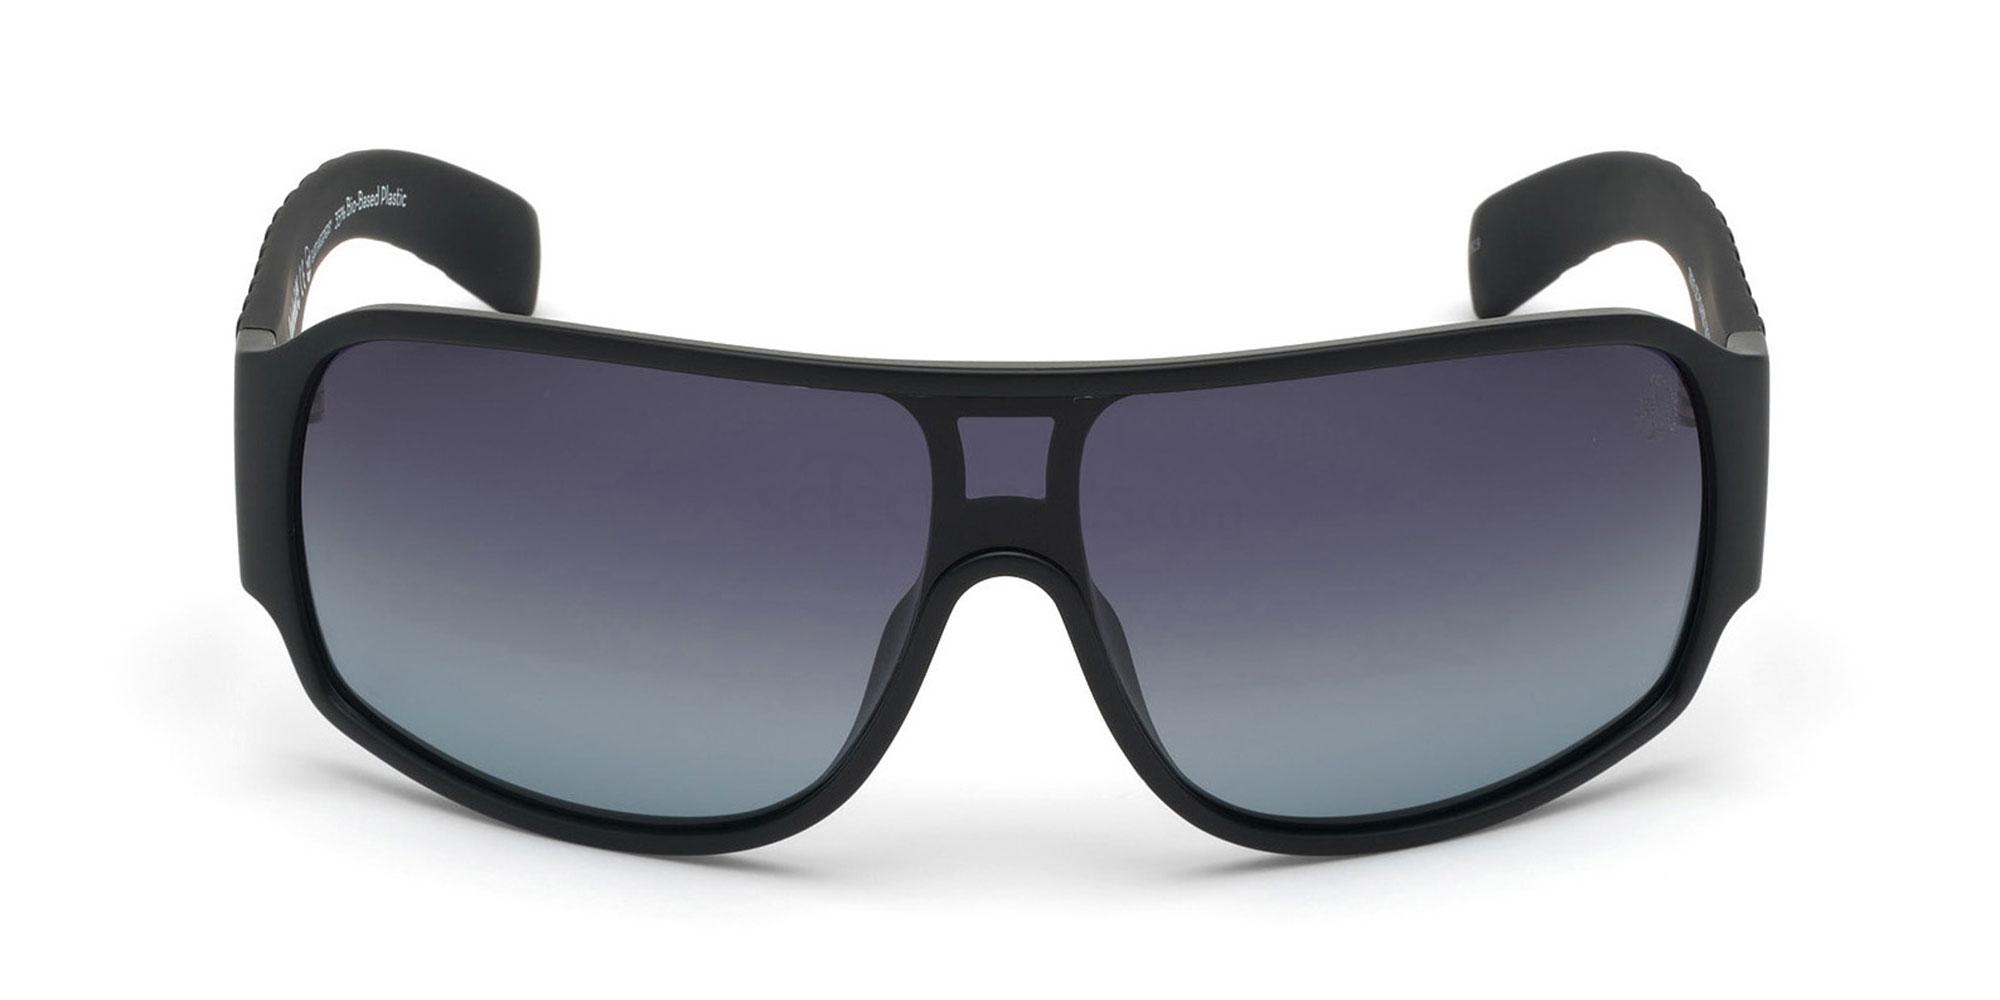 02D TB9216 Sunglasses, Timberland